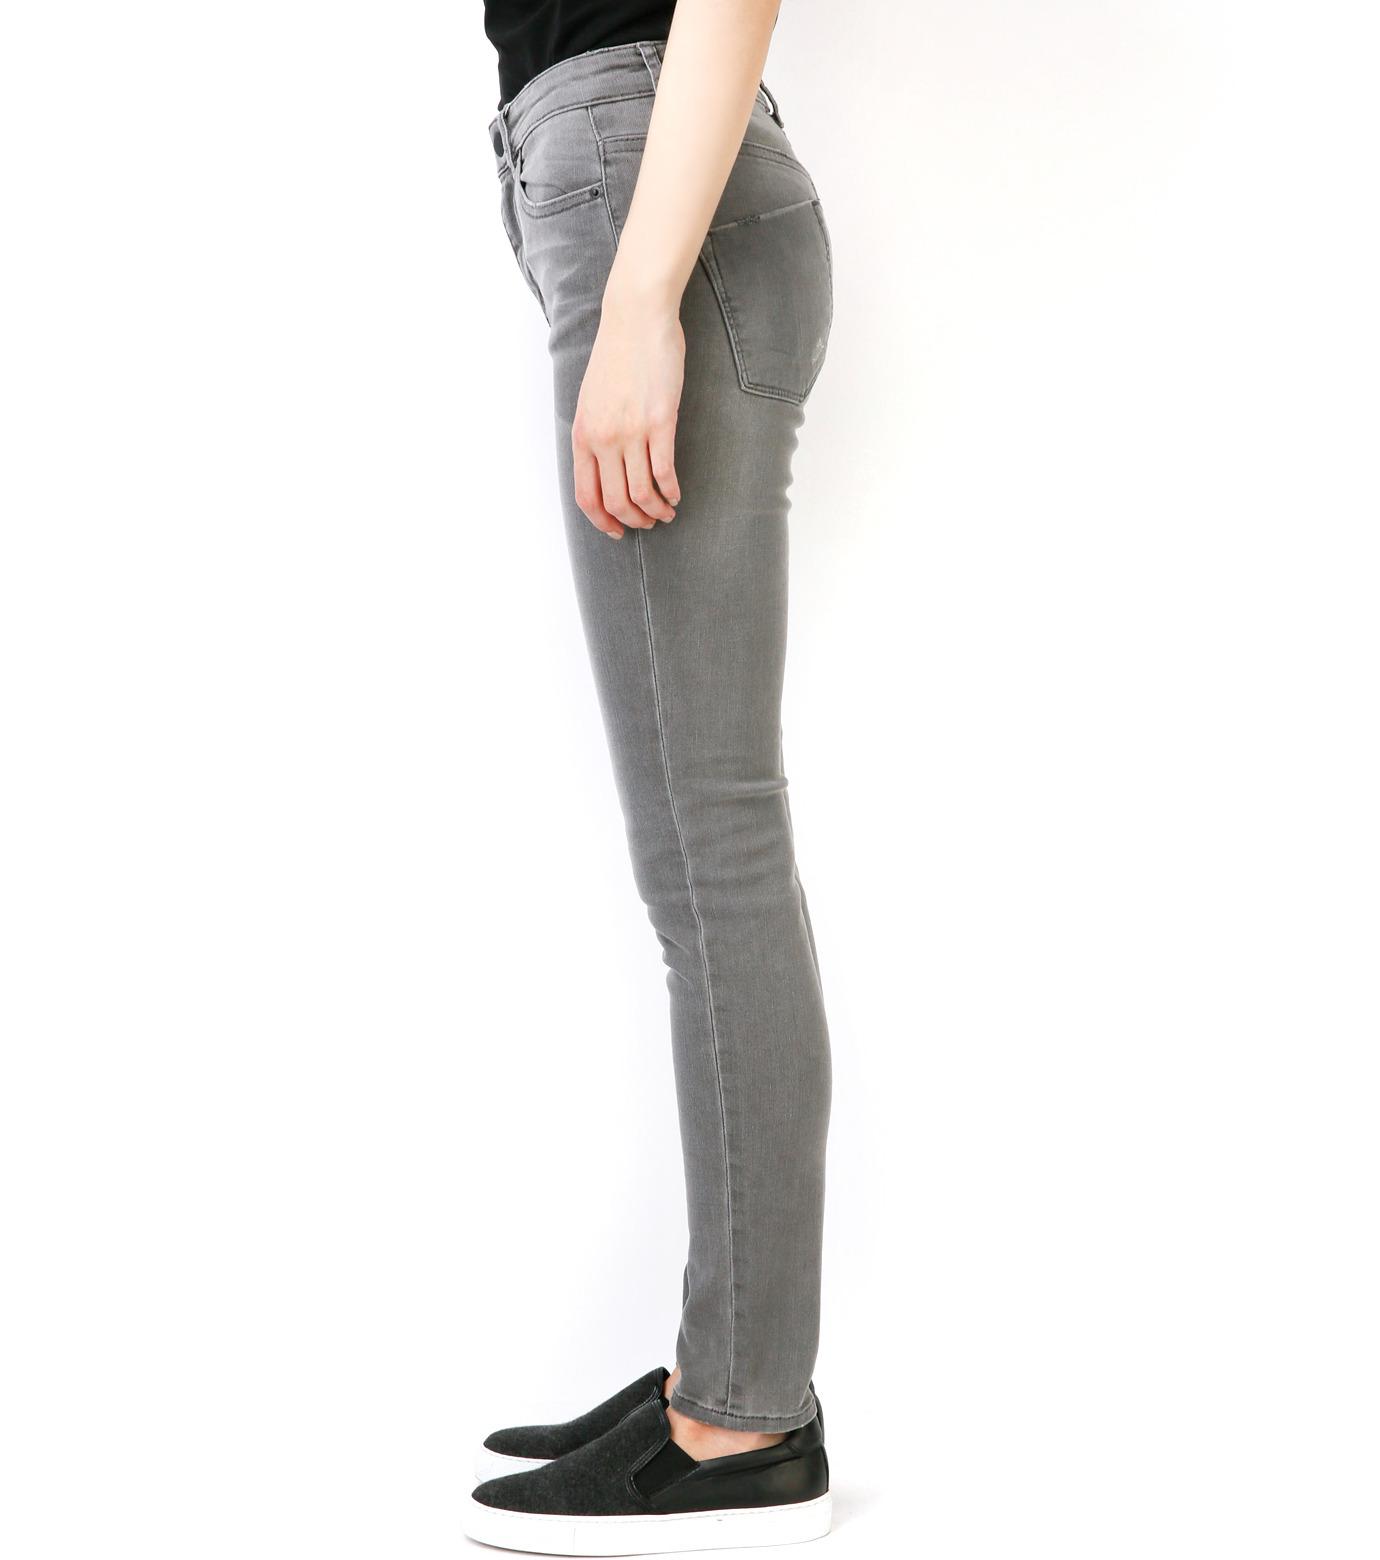 LE CIEL BLEU(ルシェルブルー)のグレ-スキニ- by Essentials-GRAY(パンツ/pants)-17S68008 拡大詳細画像4